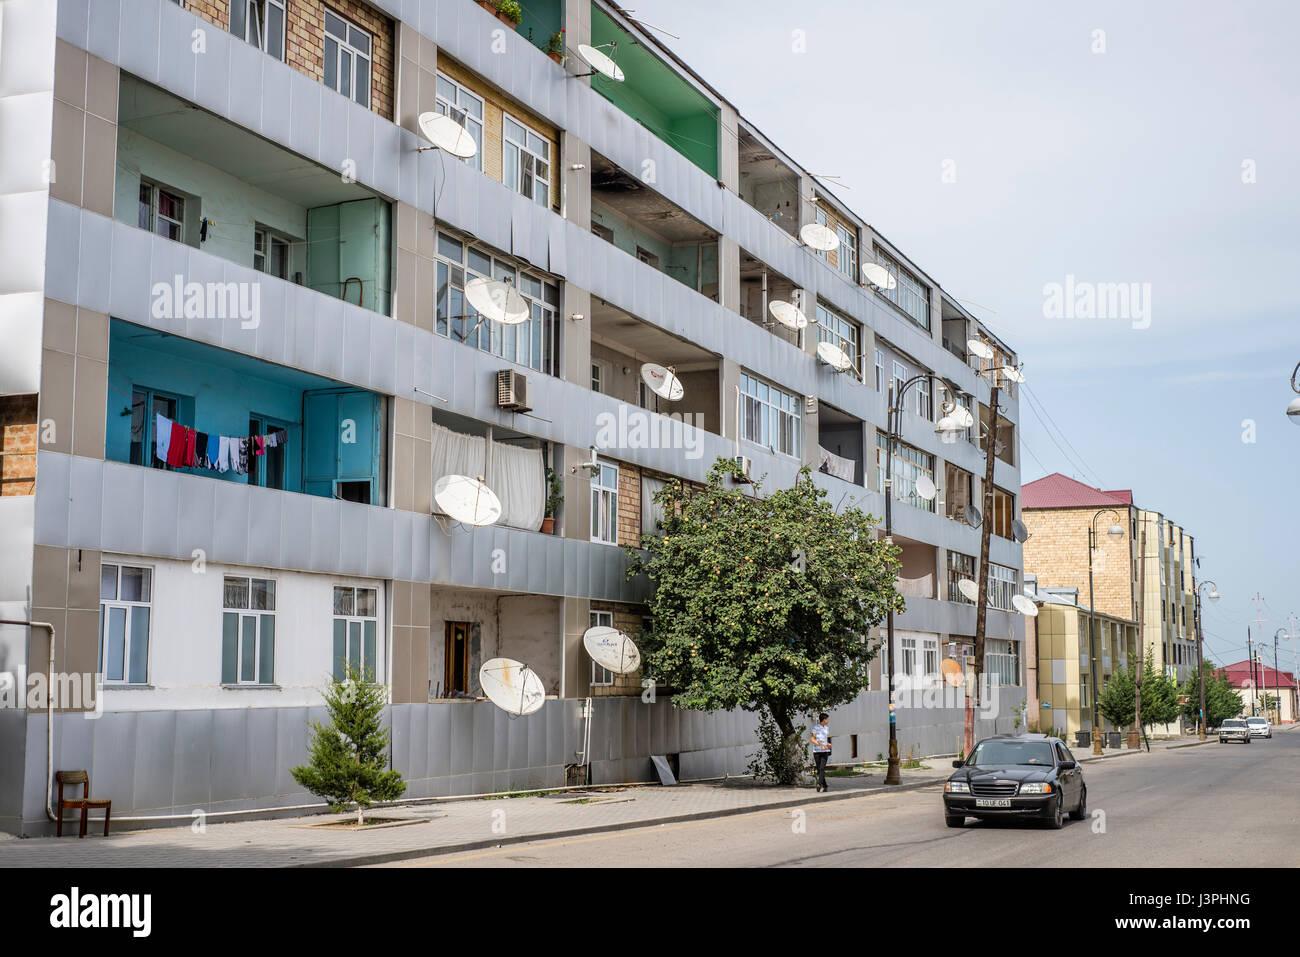 A street in Quba town, Azerbaijan - Stock Image